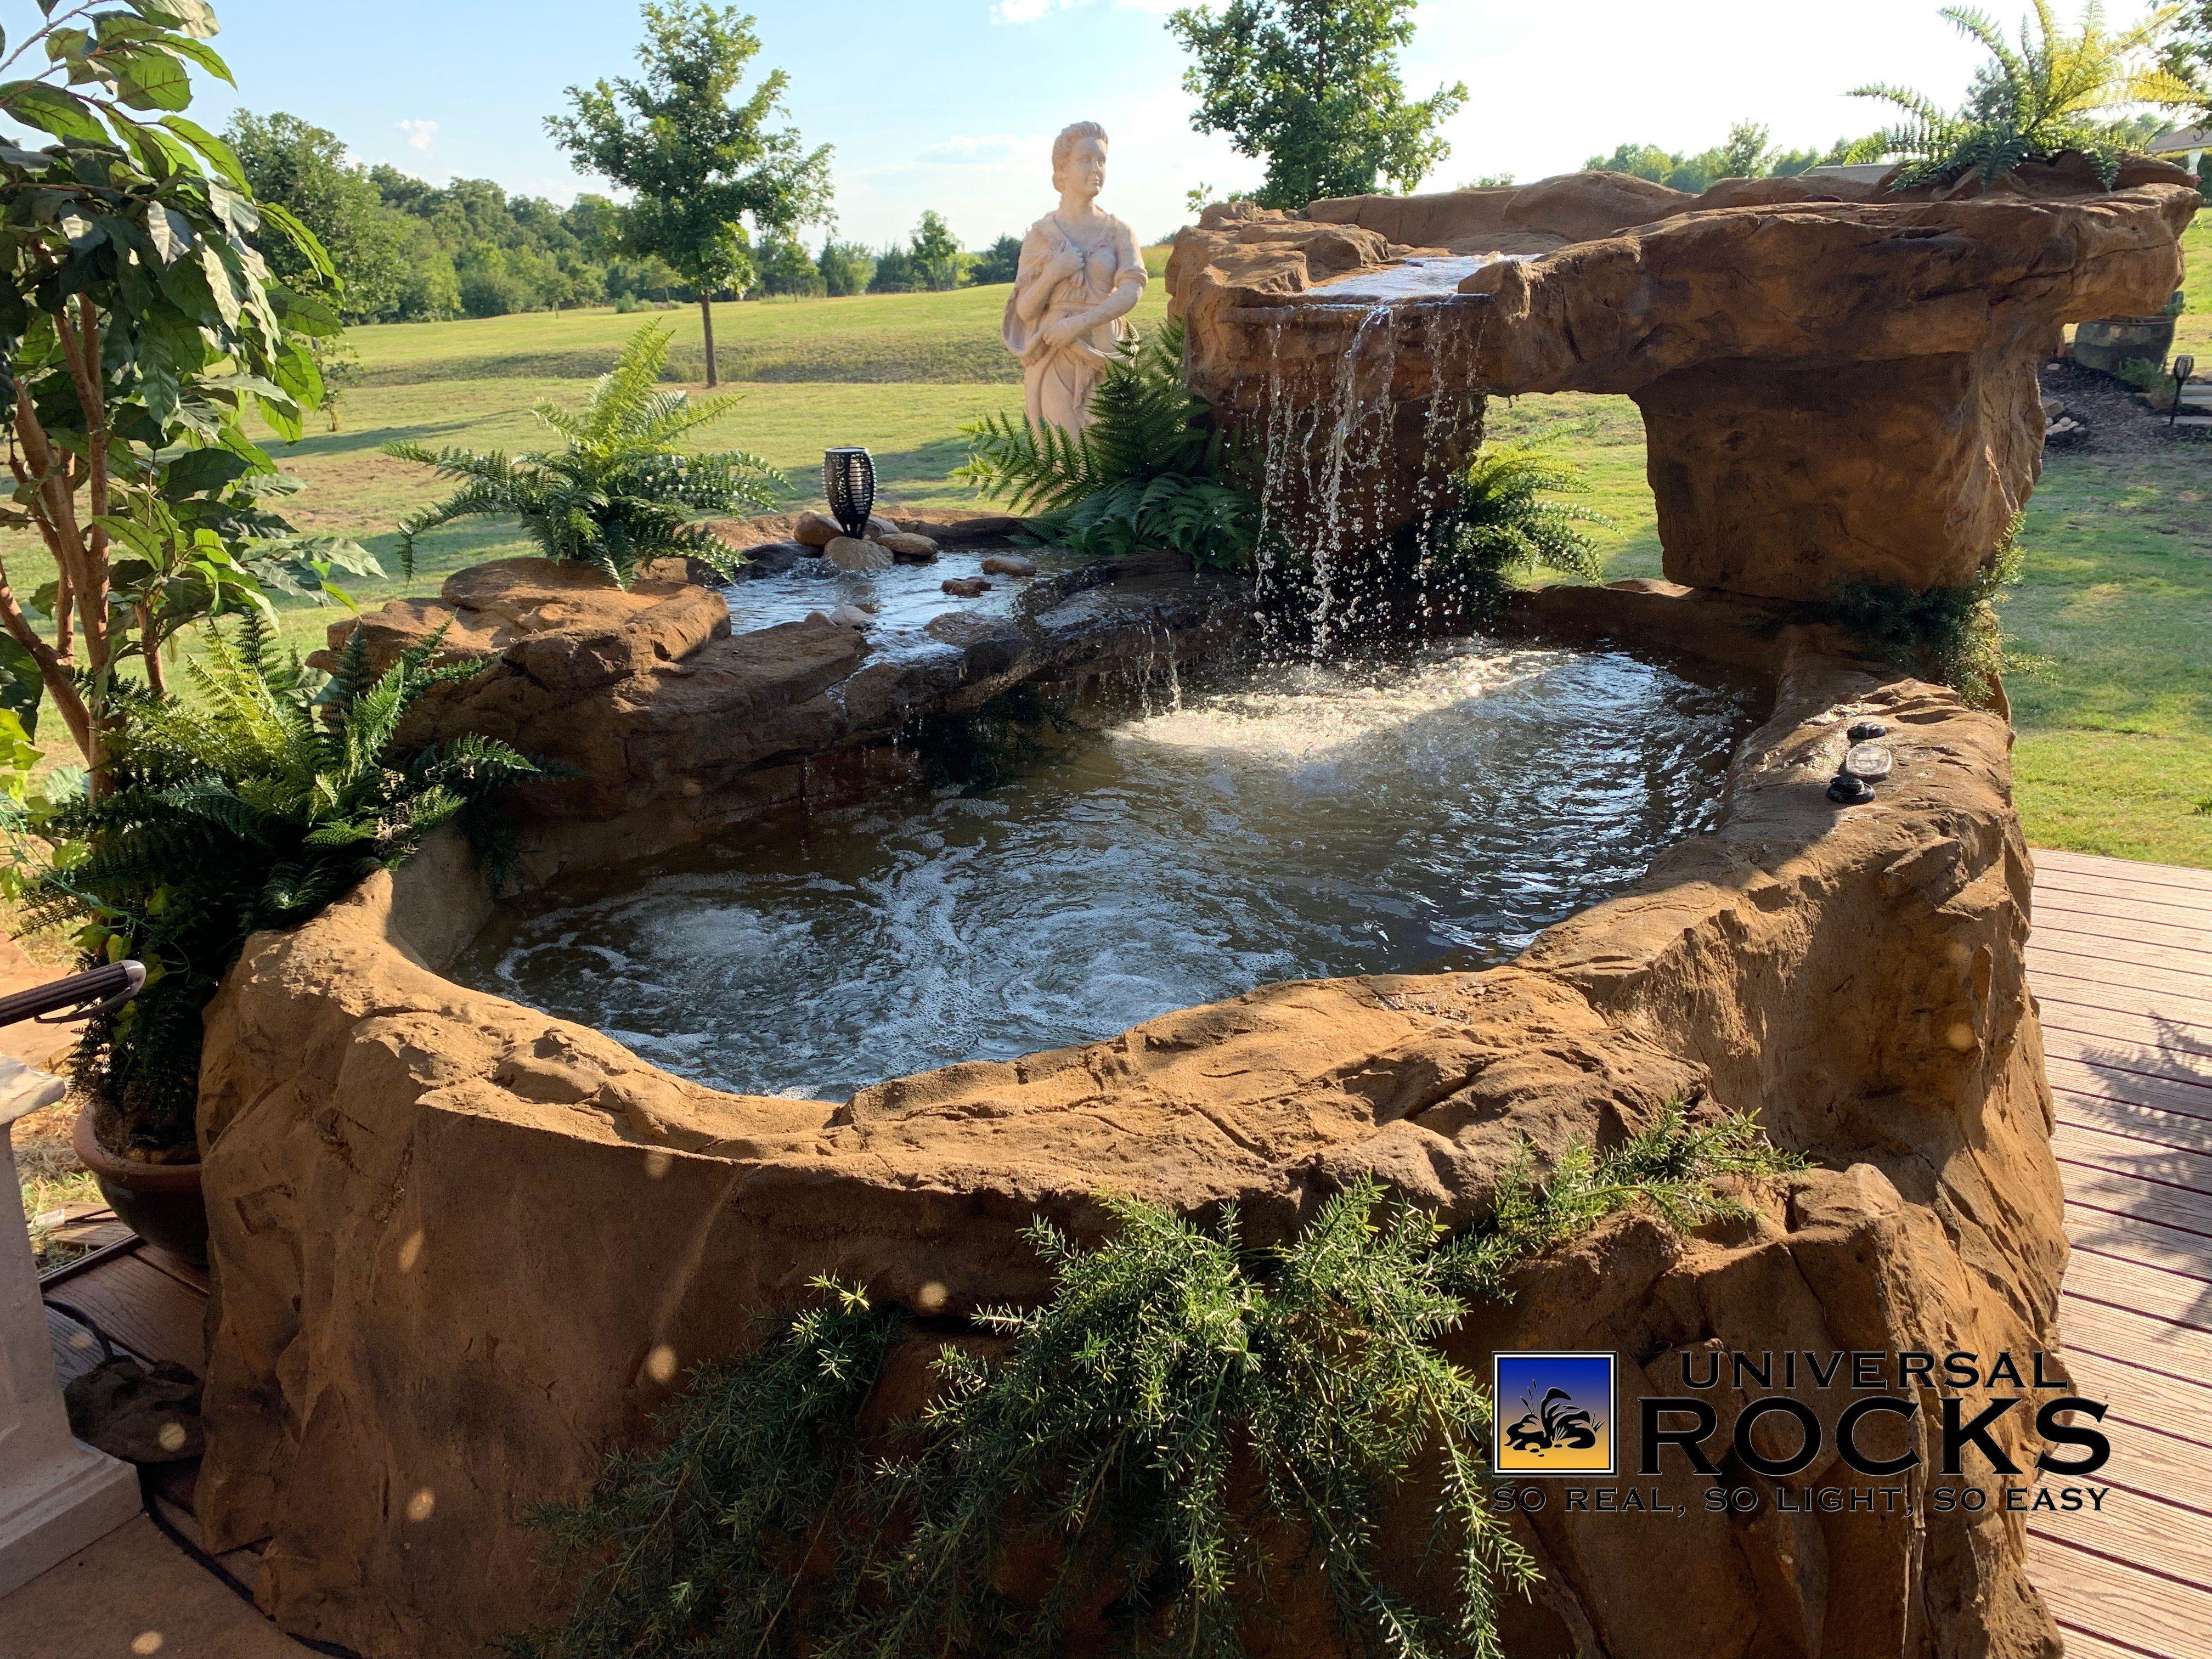 Above Ground Hot Tub Spa Universal Rocks Hot Tub Landscaping Spa Hot Tubs Hot Tub